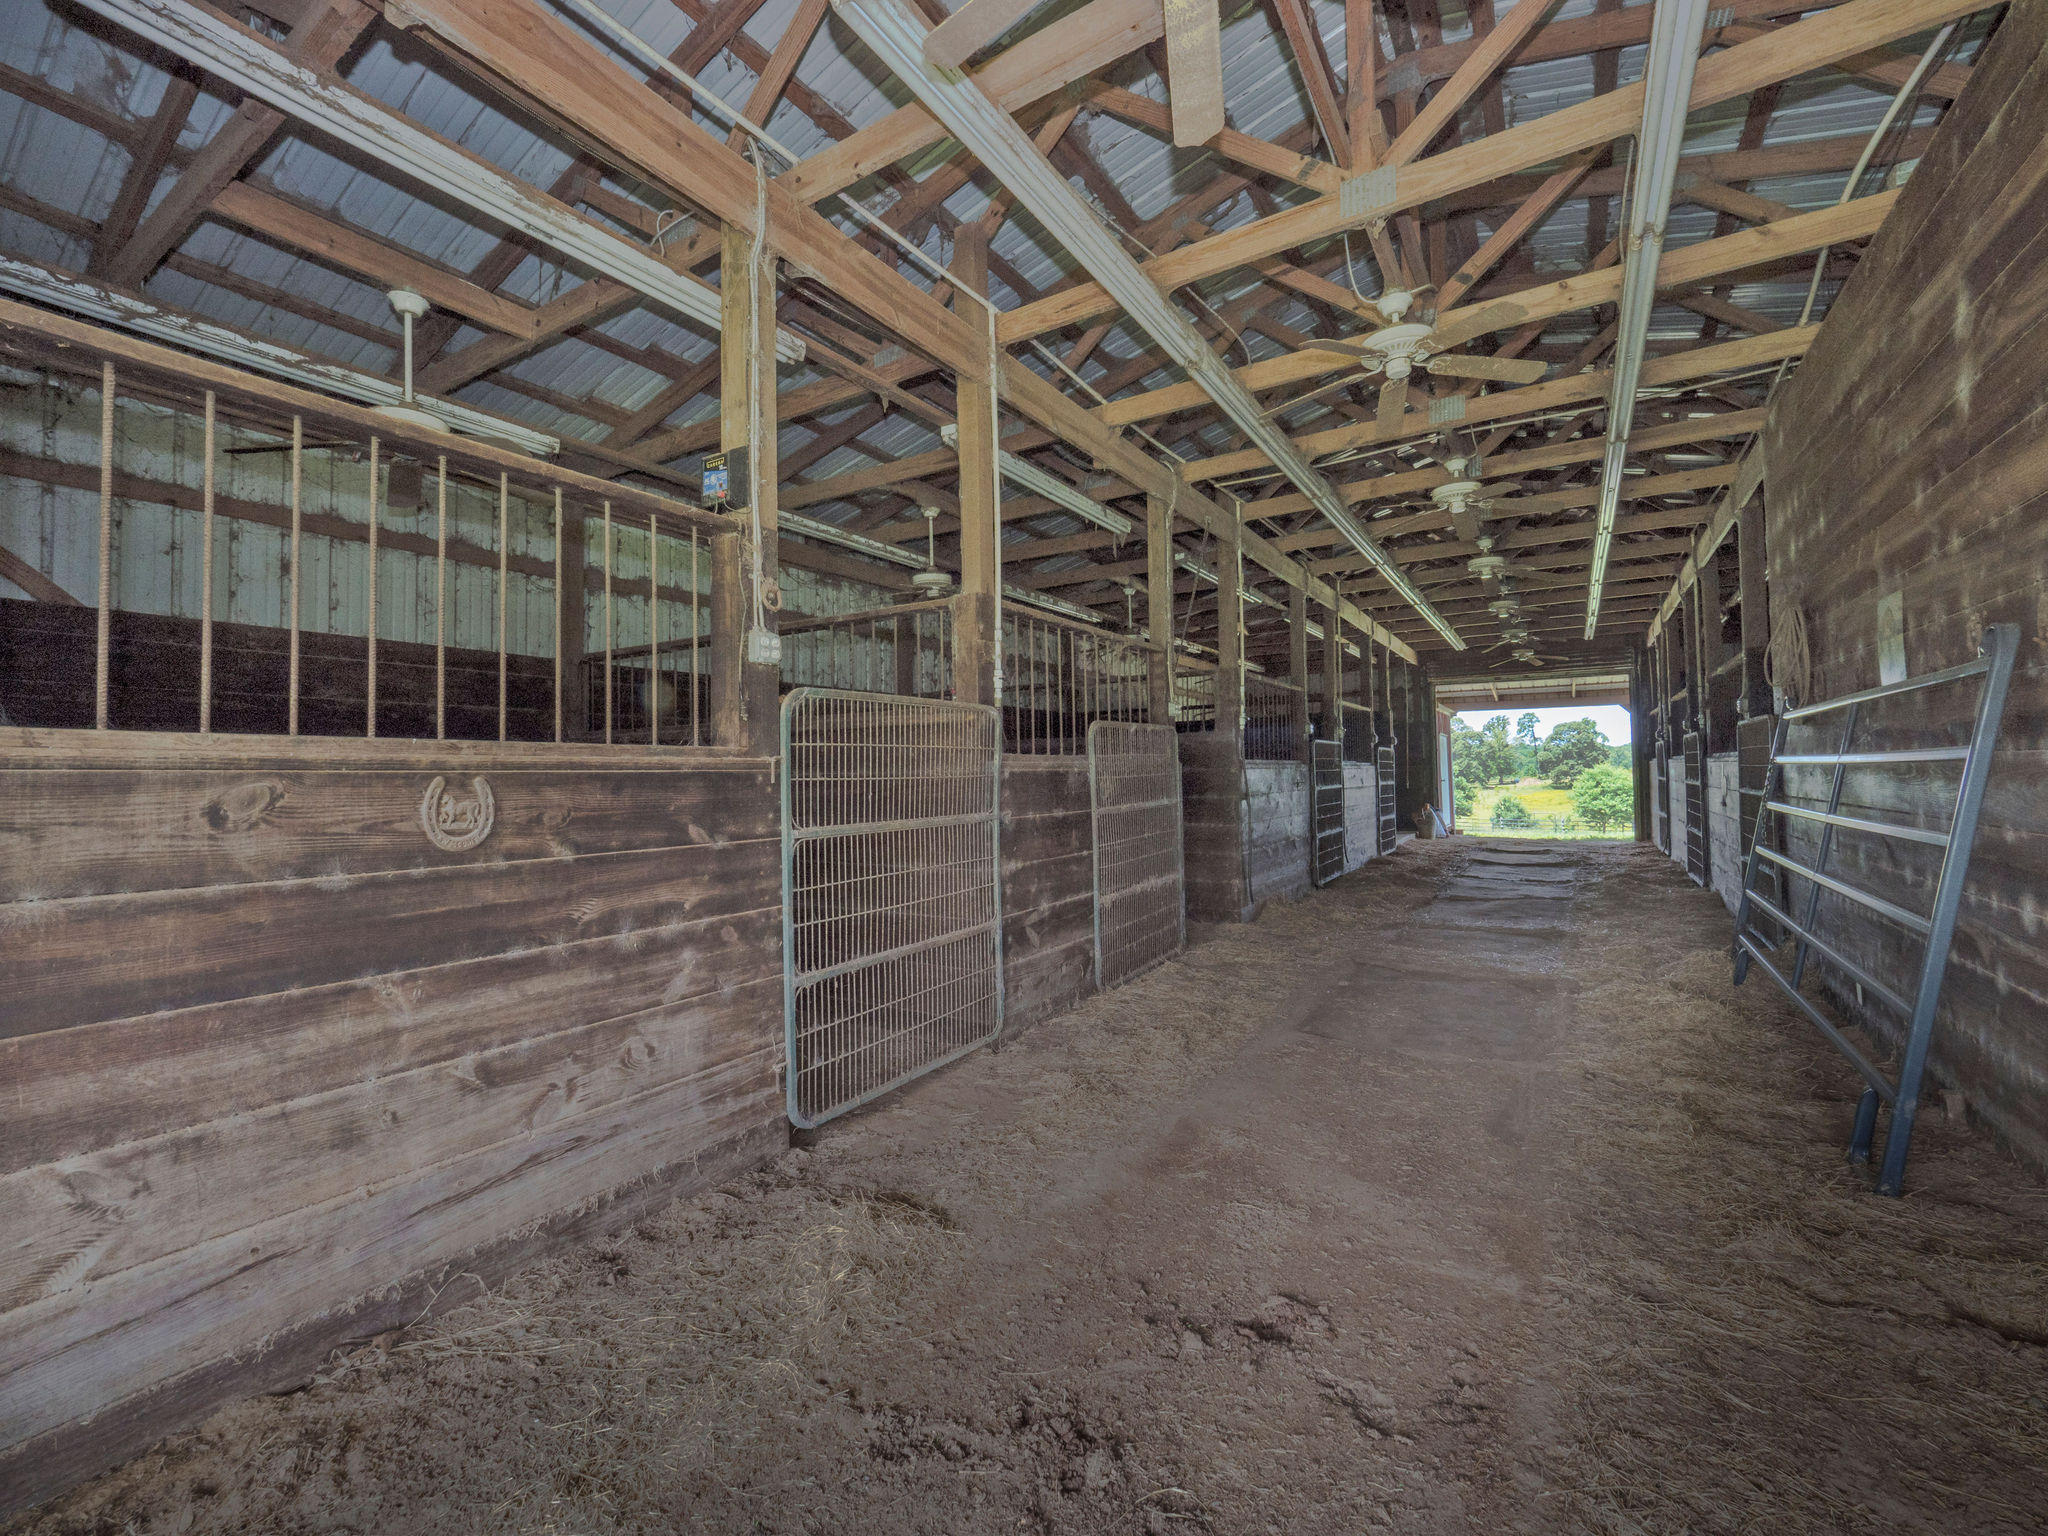 Anacoco home for sale, 472 Liles Rd, Anacoco LA - $385,000